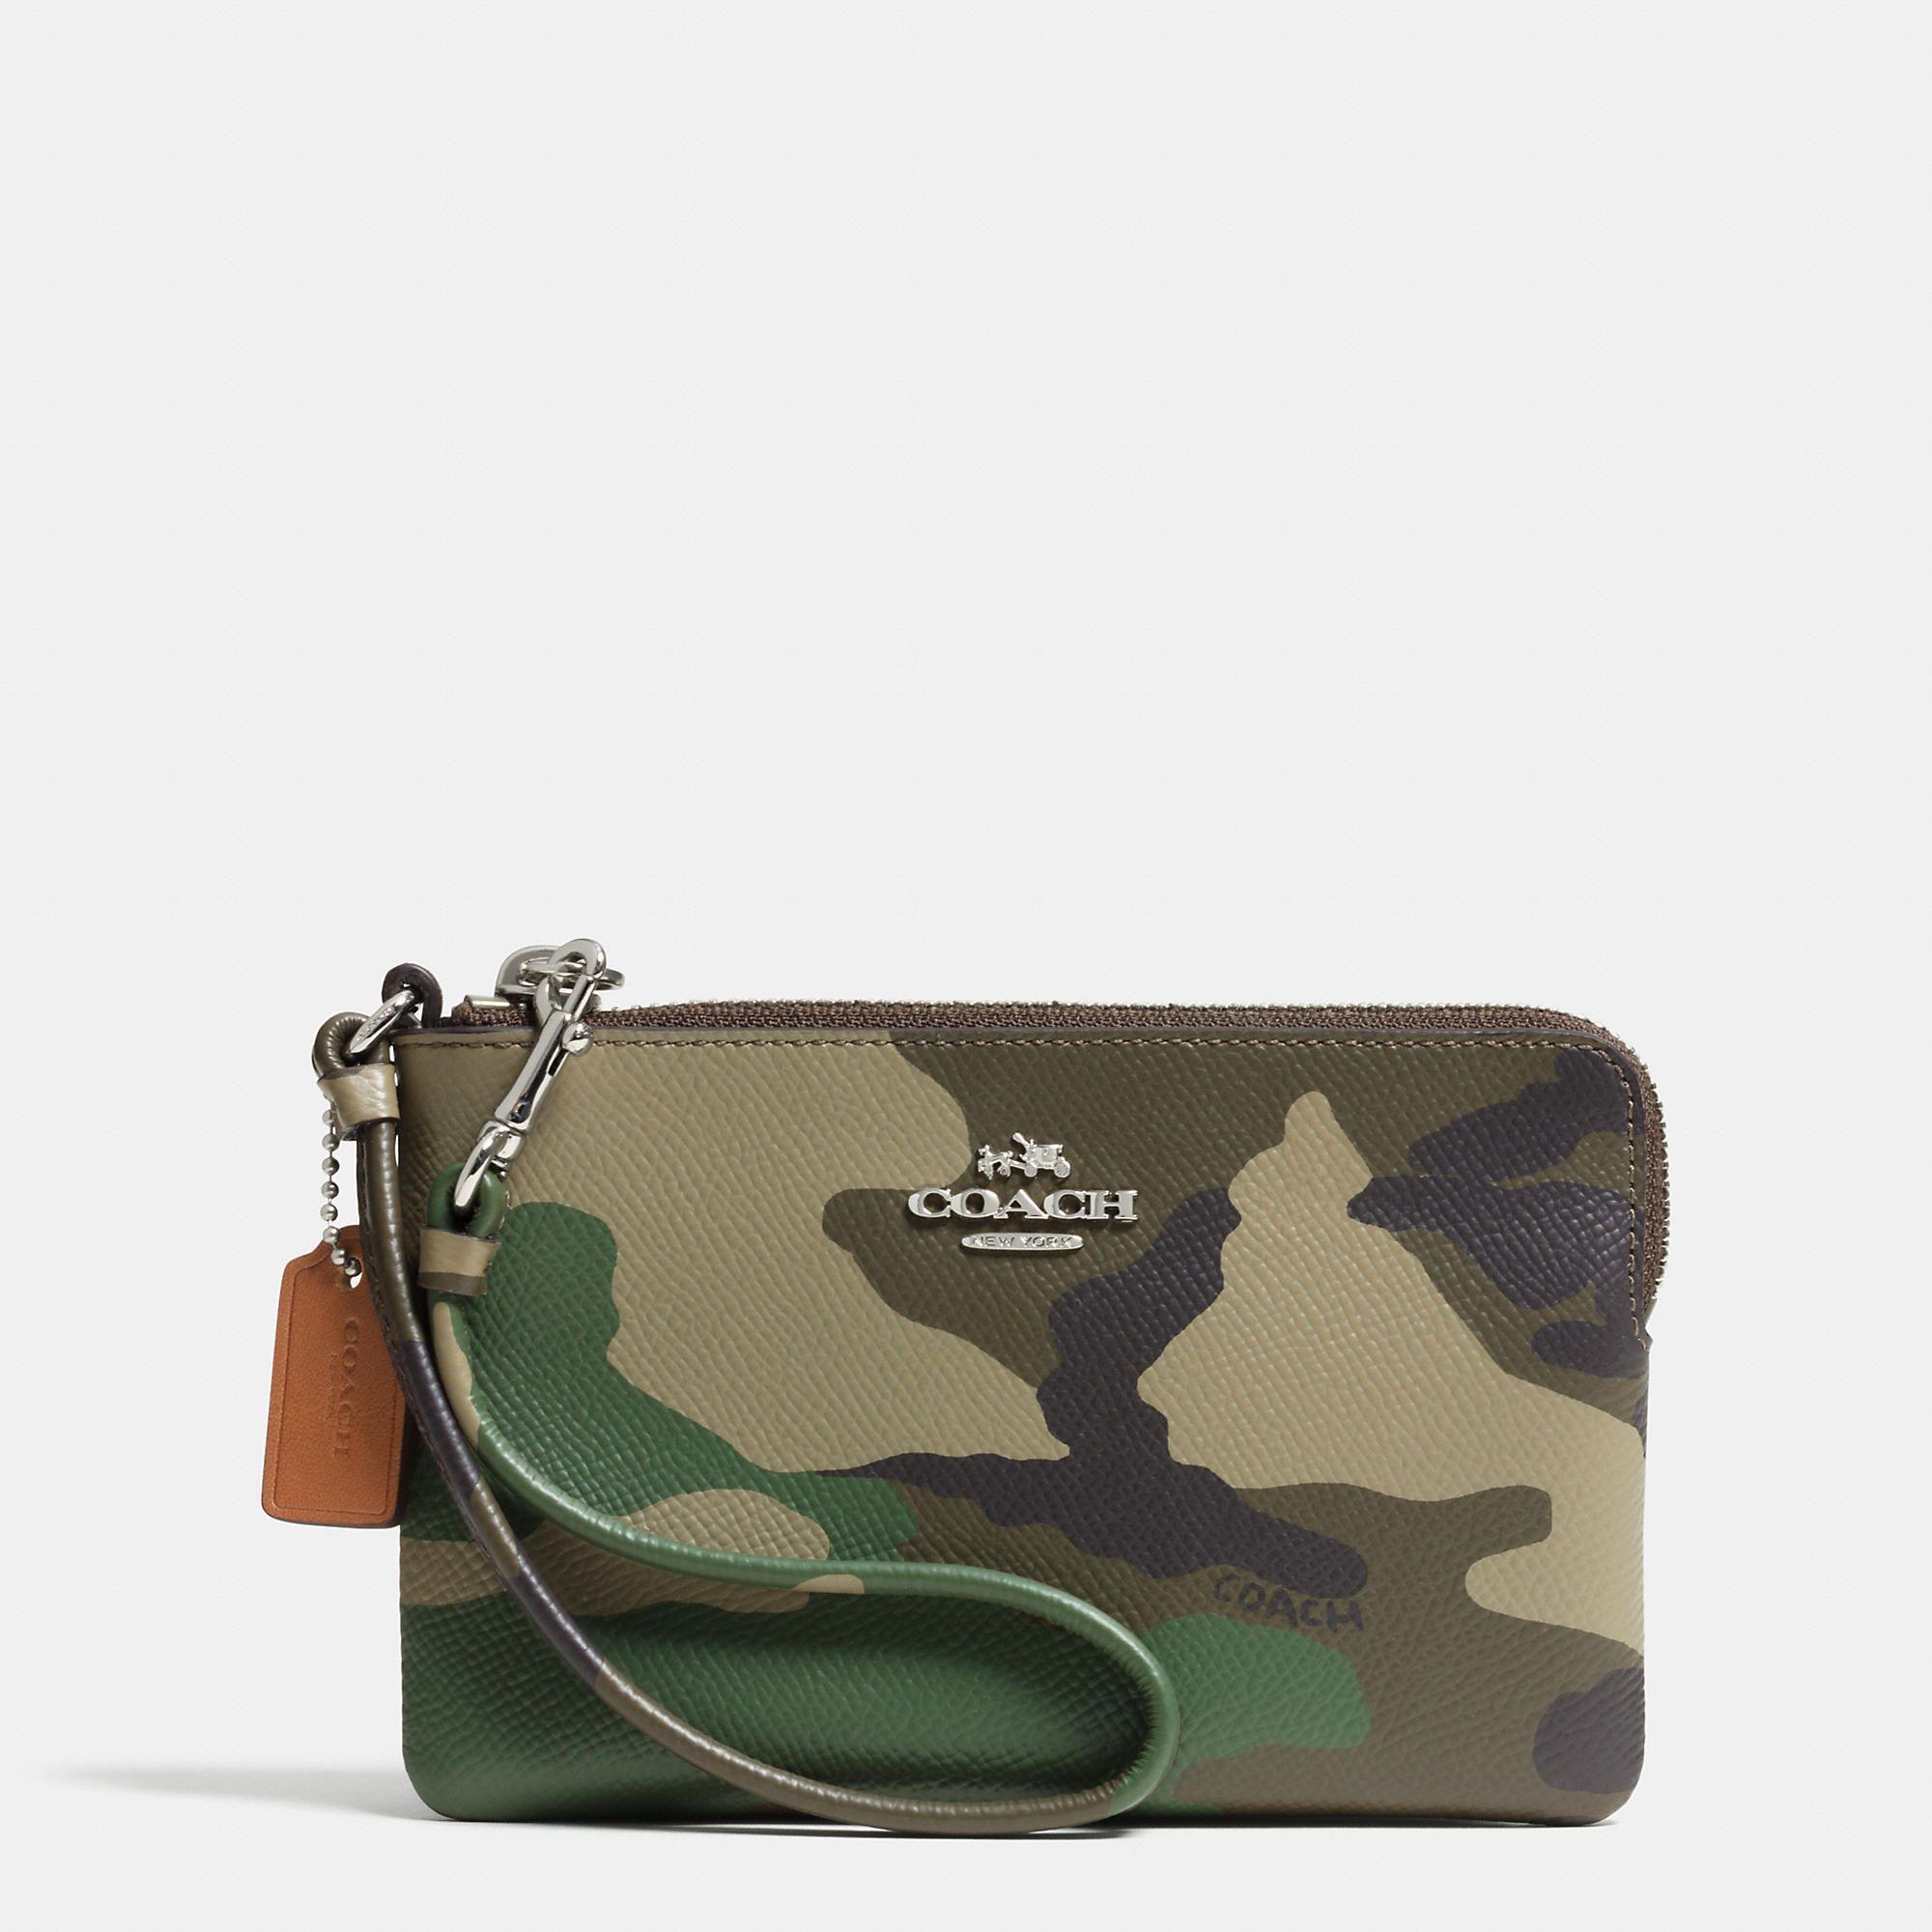 5016c032ef42b Small L-Zip Wristlet in Camo Print Crossgrain Leather | Bag lady ...